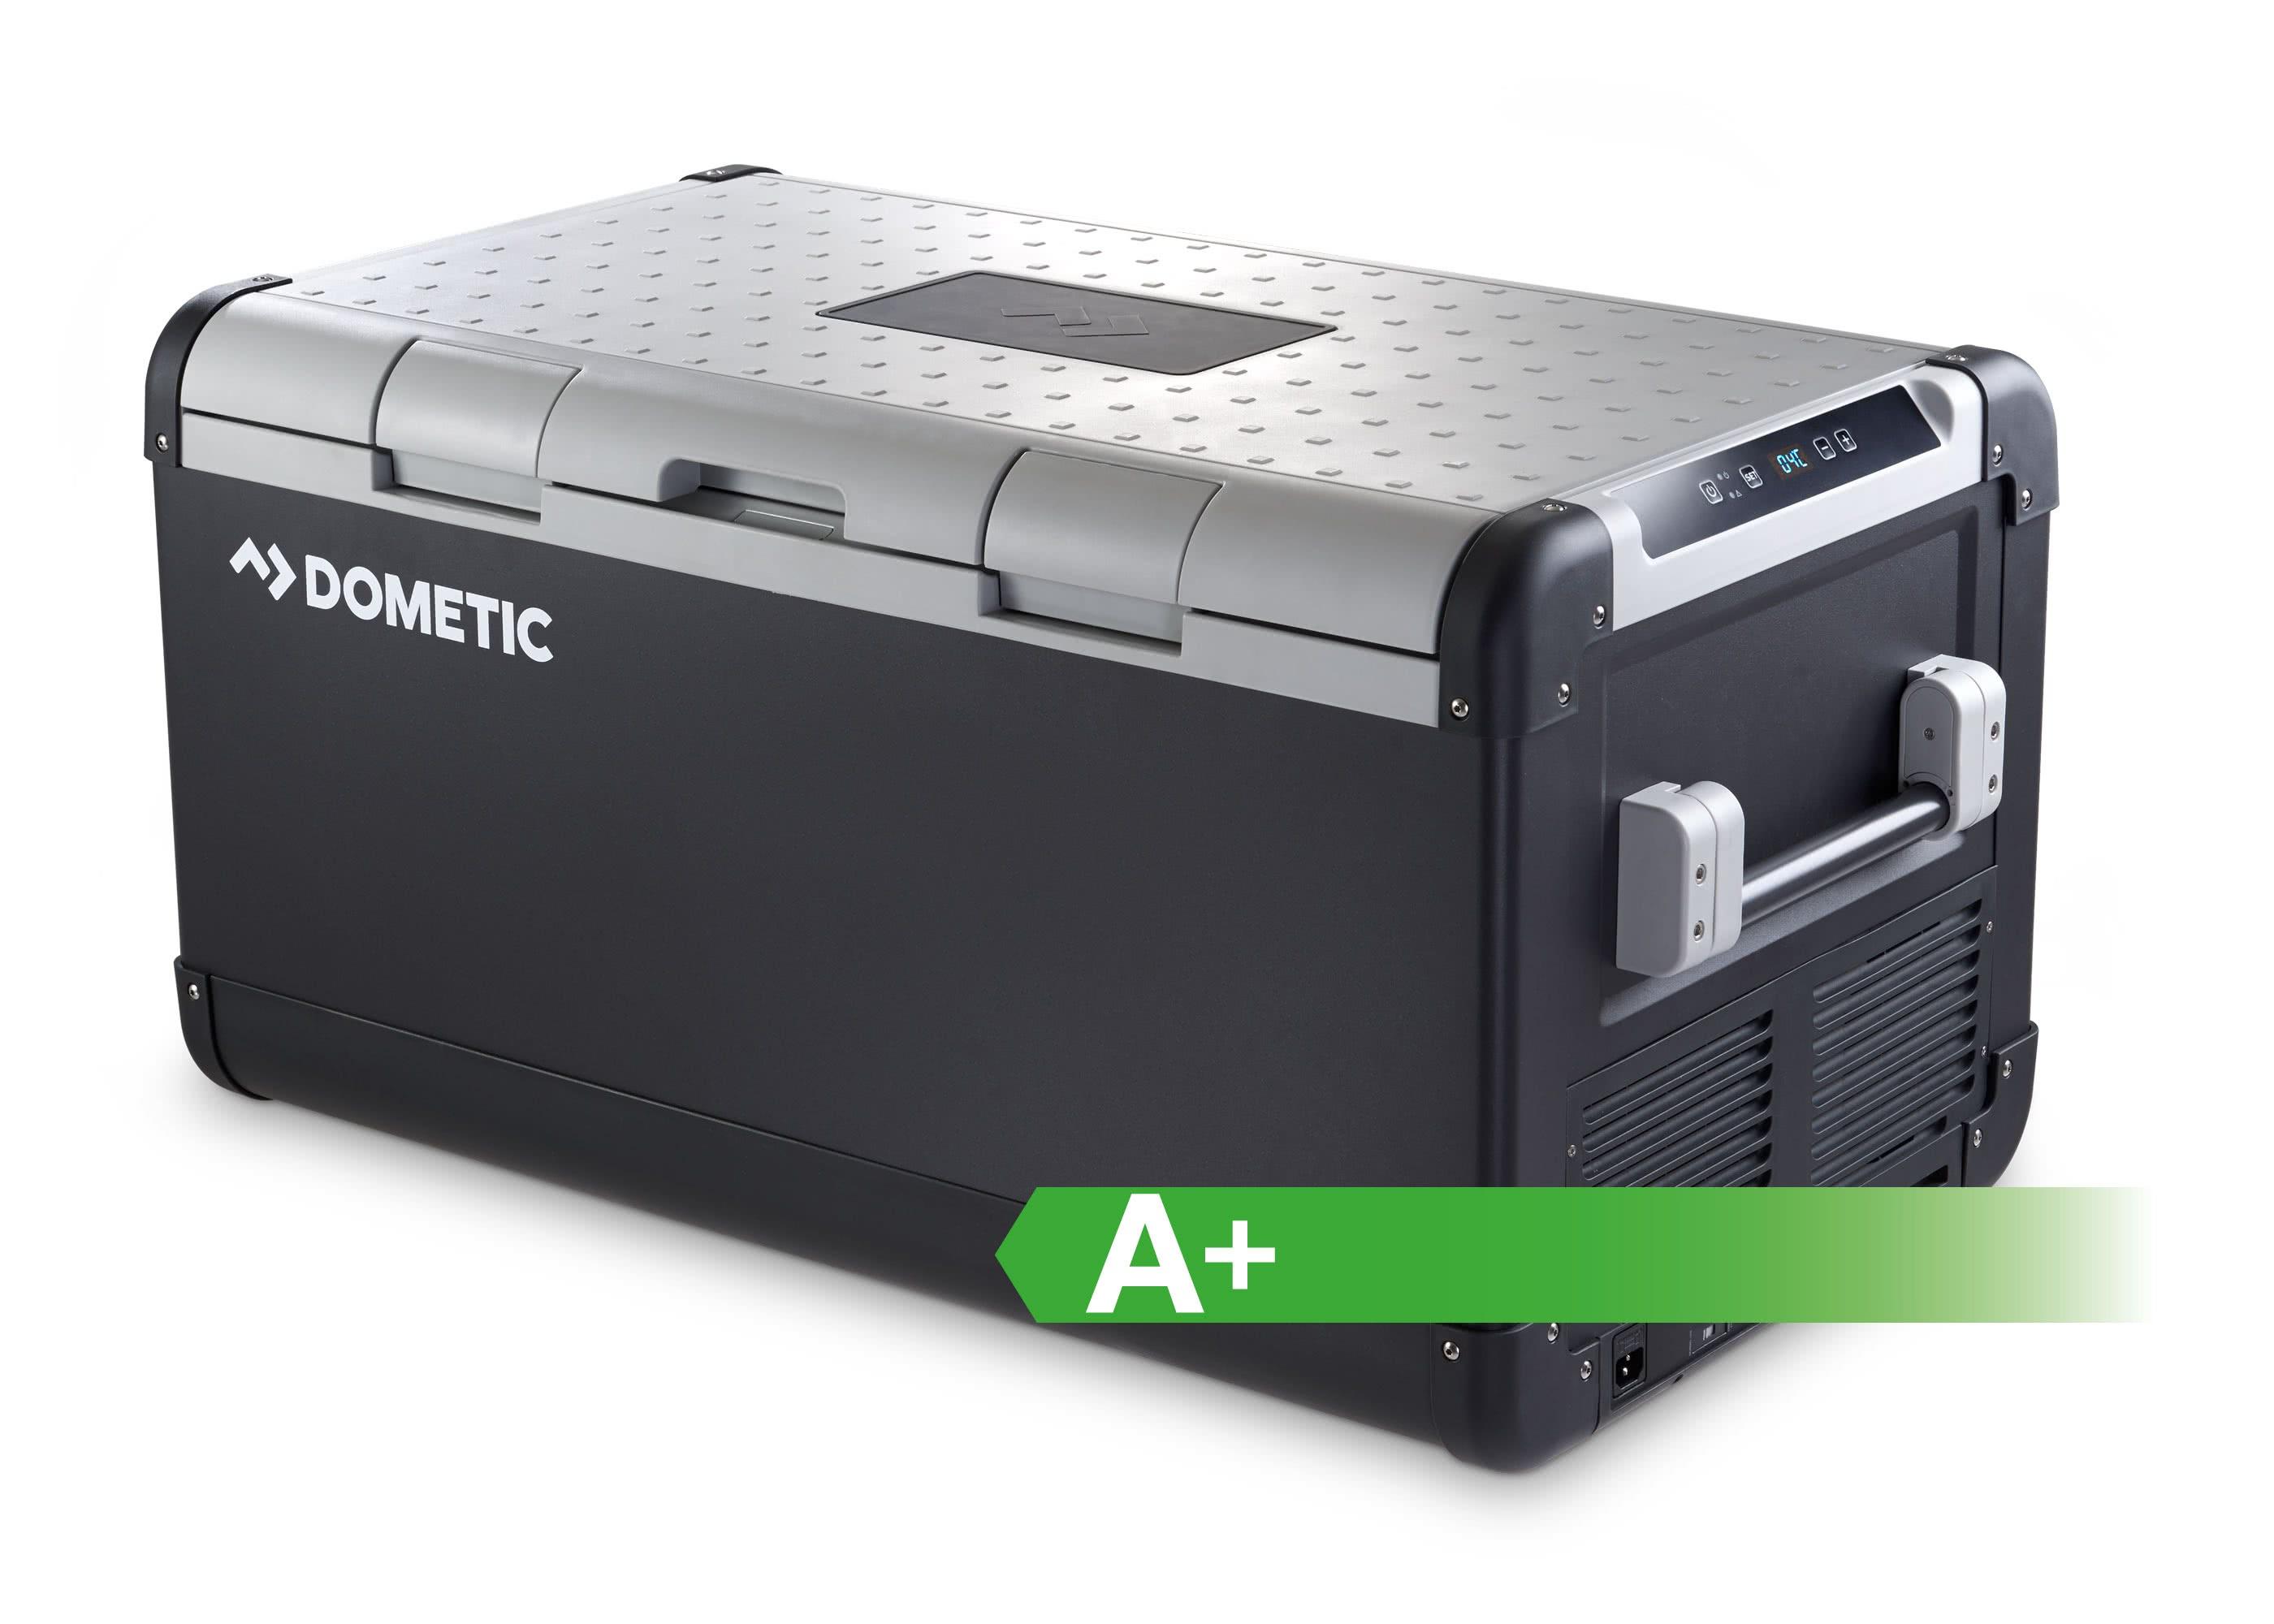 (SVB.de) DOMETIC CoolFreeze CFX100/CFX50 Kompressor-Kühlboxen